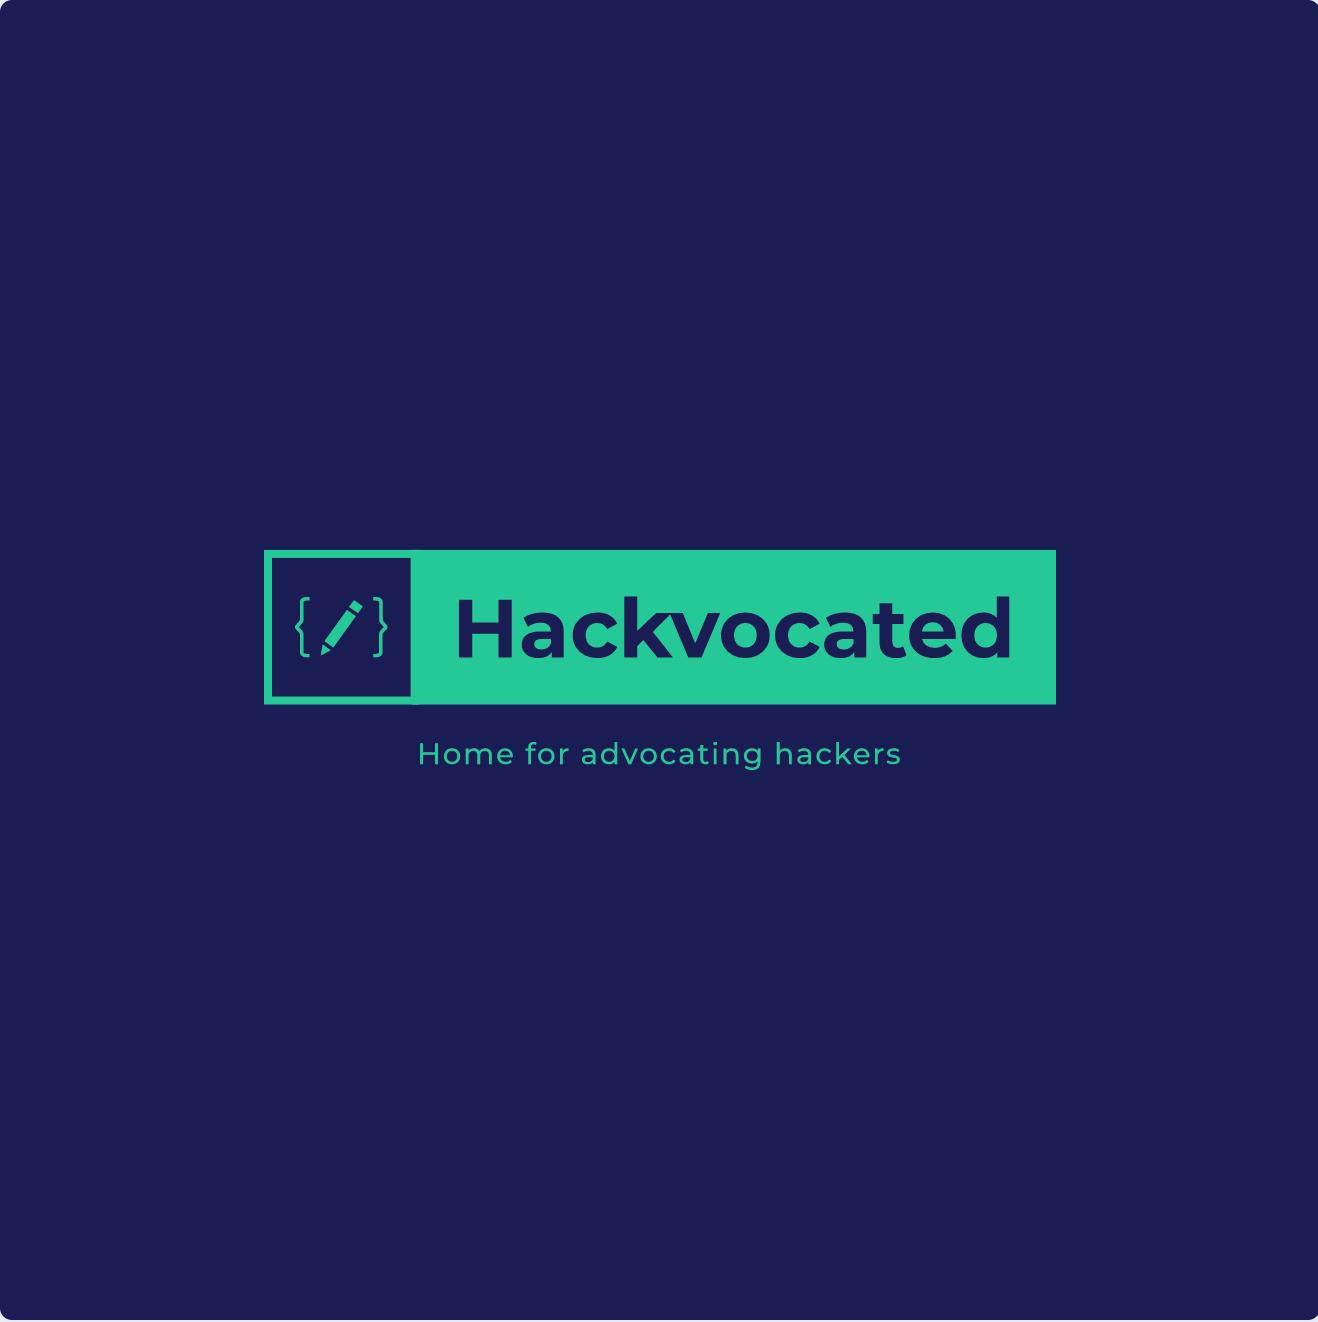 hackvocated.hashnode.dev